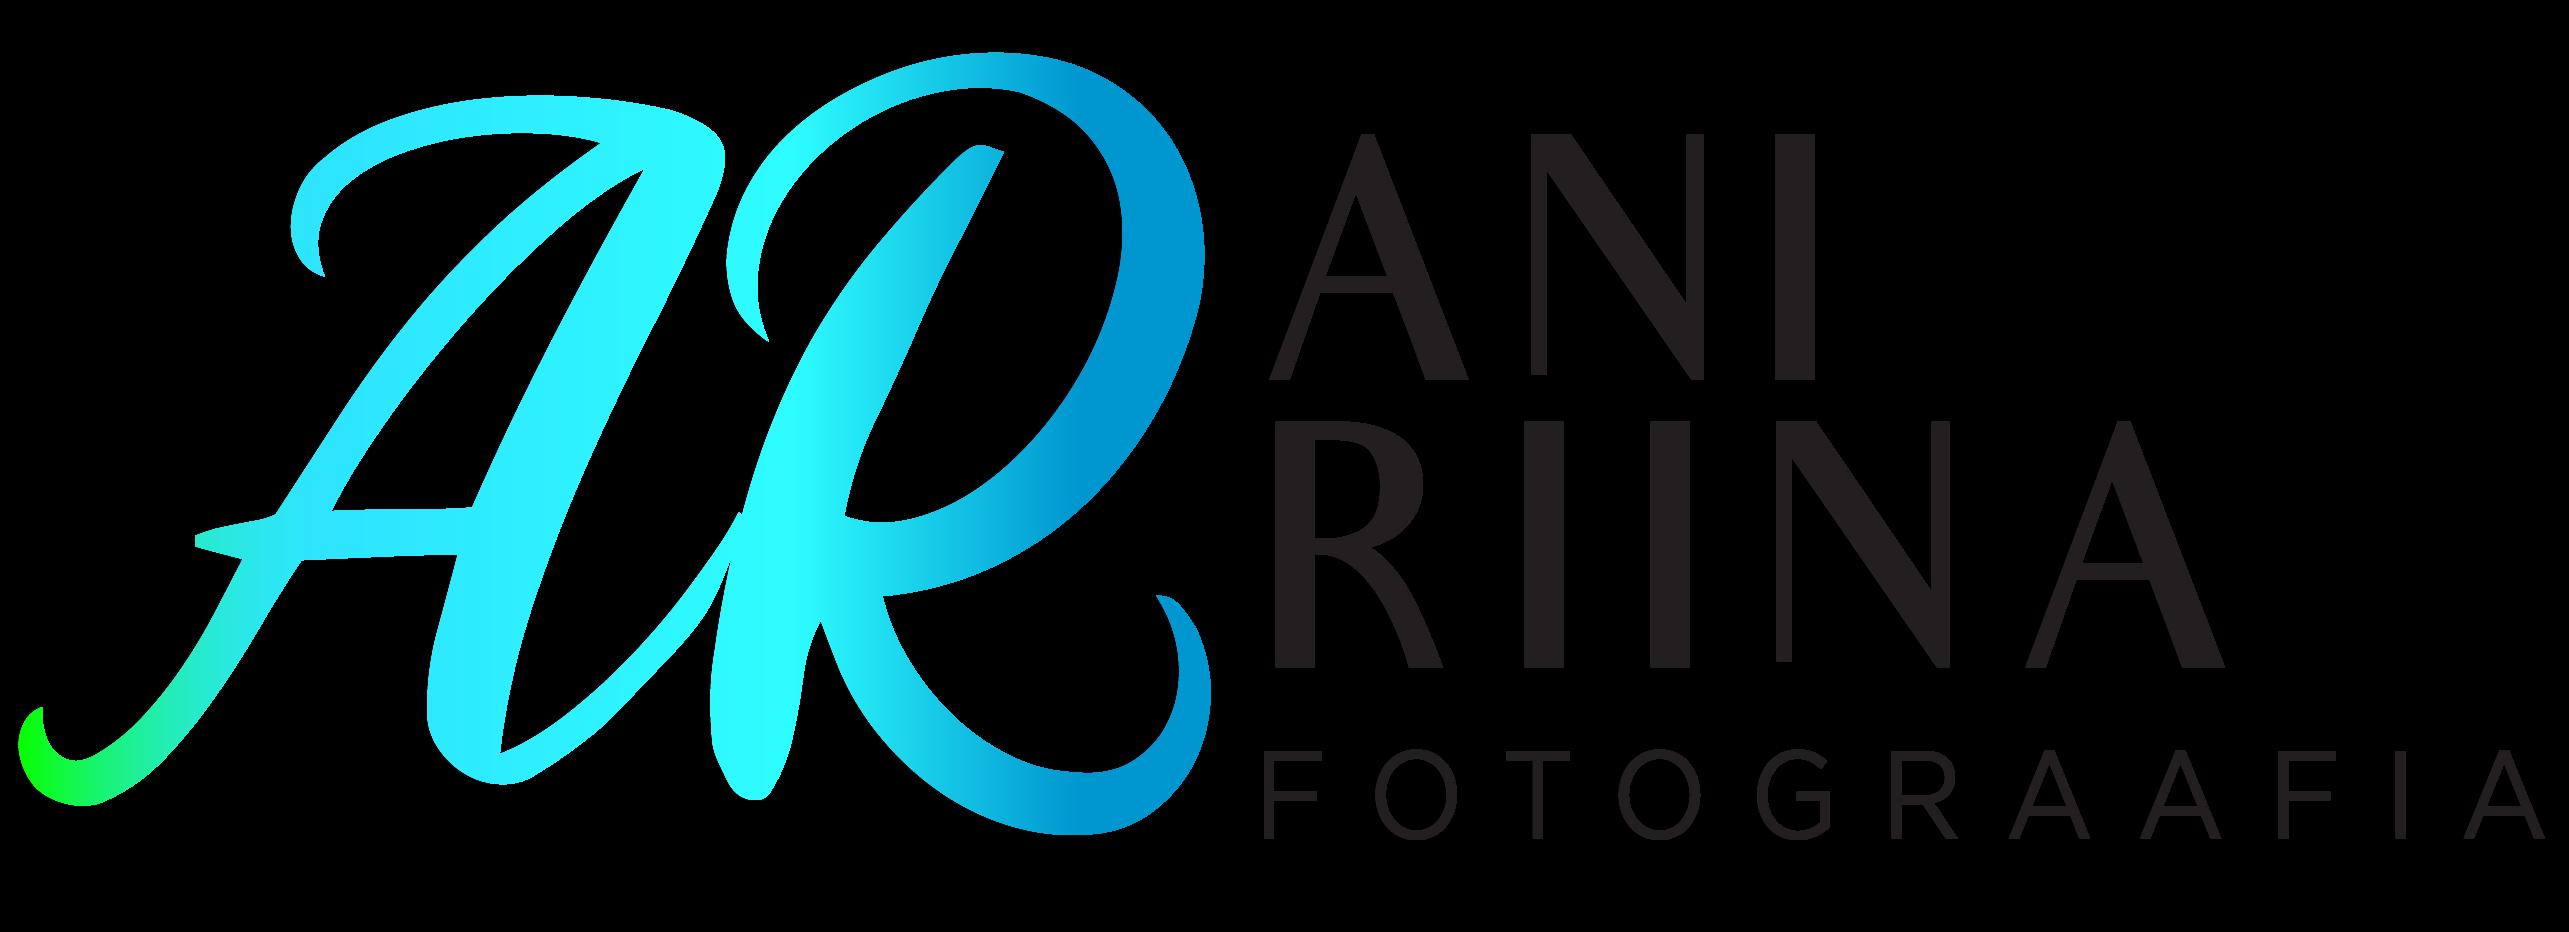 Ani Riina fotograafia